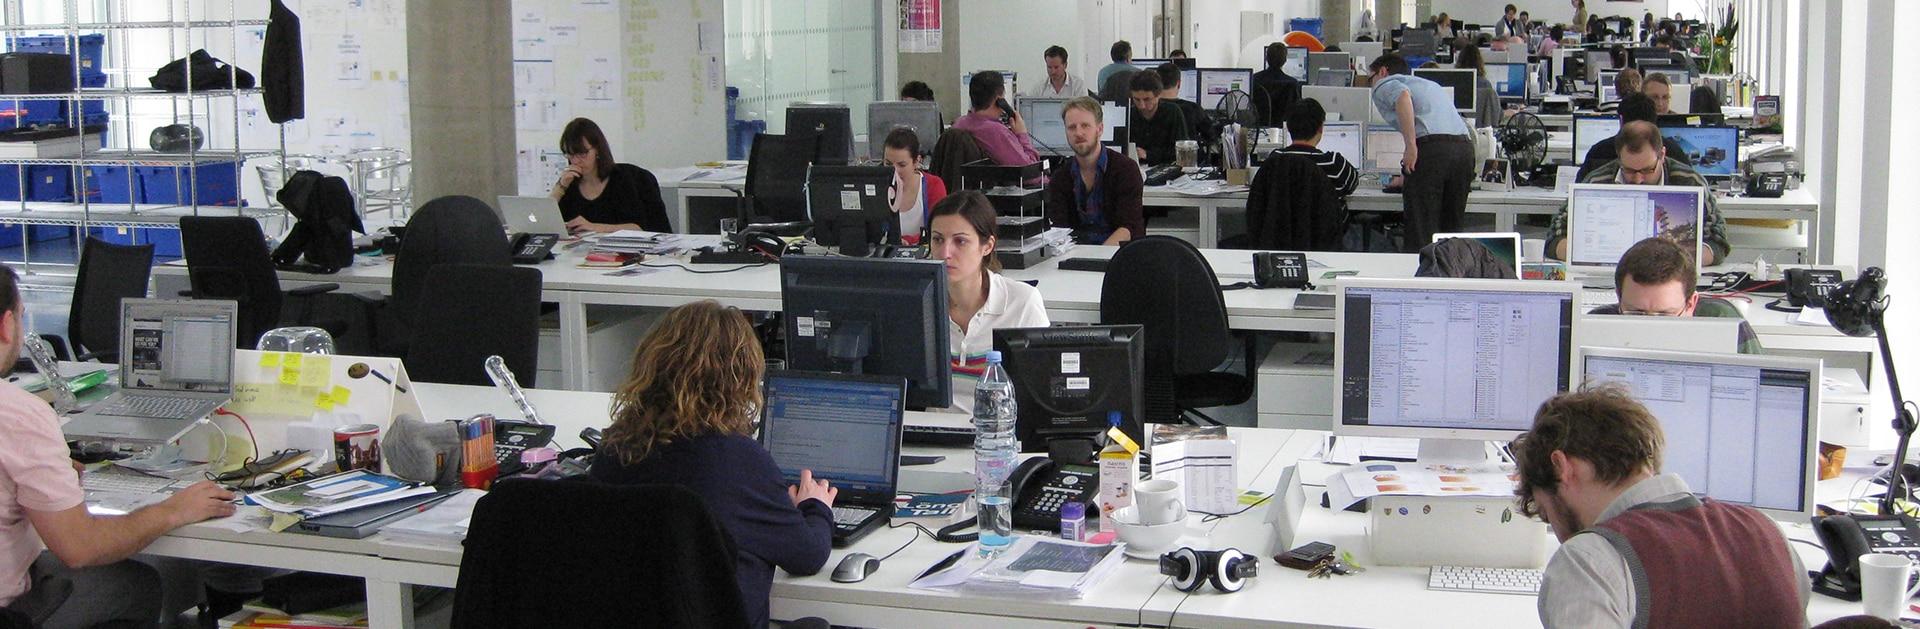 Luchtkwaliteit in kantoor monitoren met SAM Air